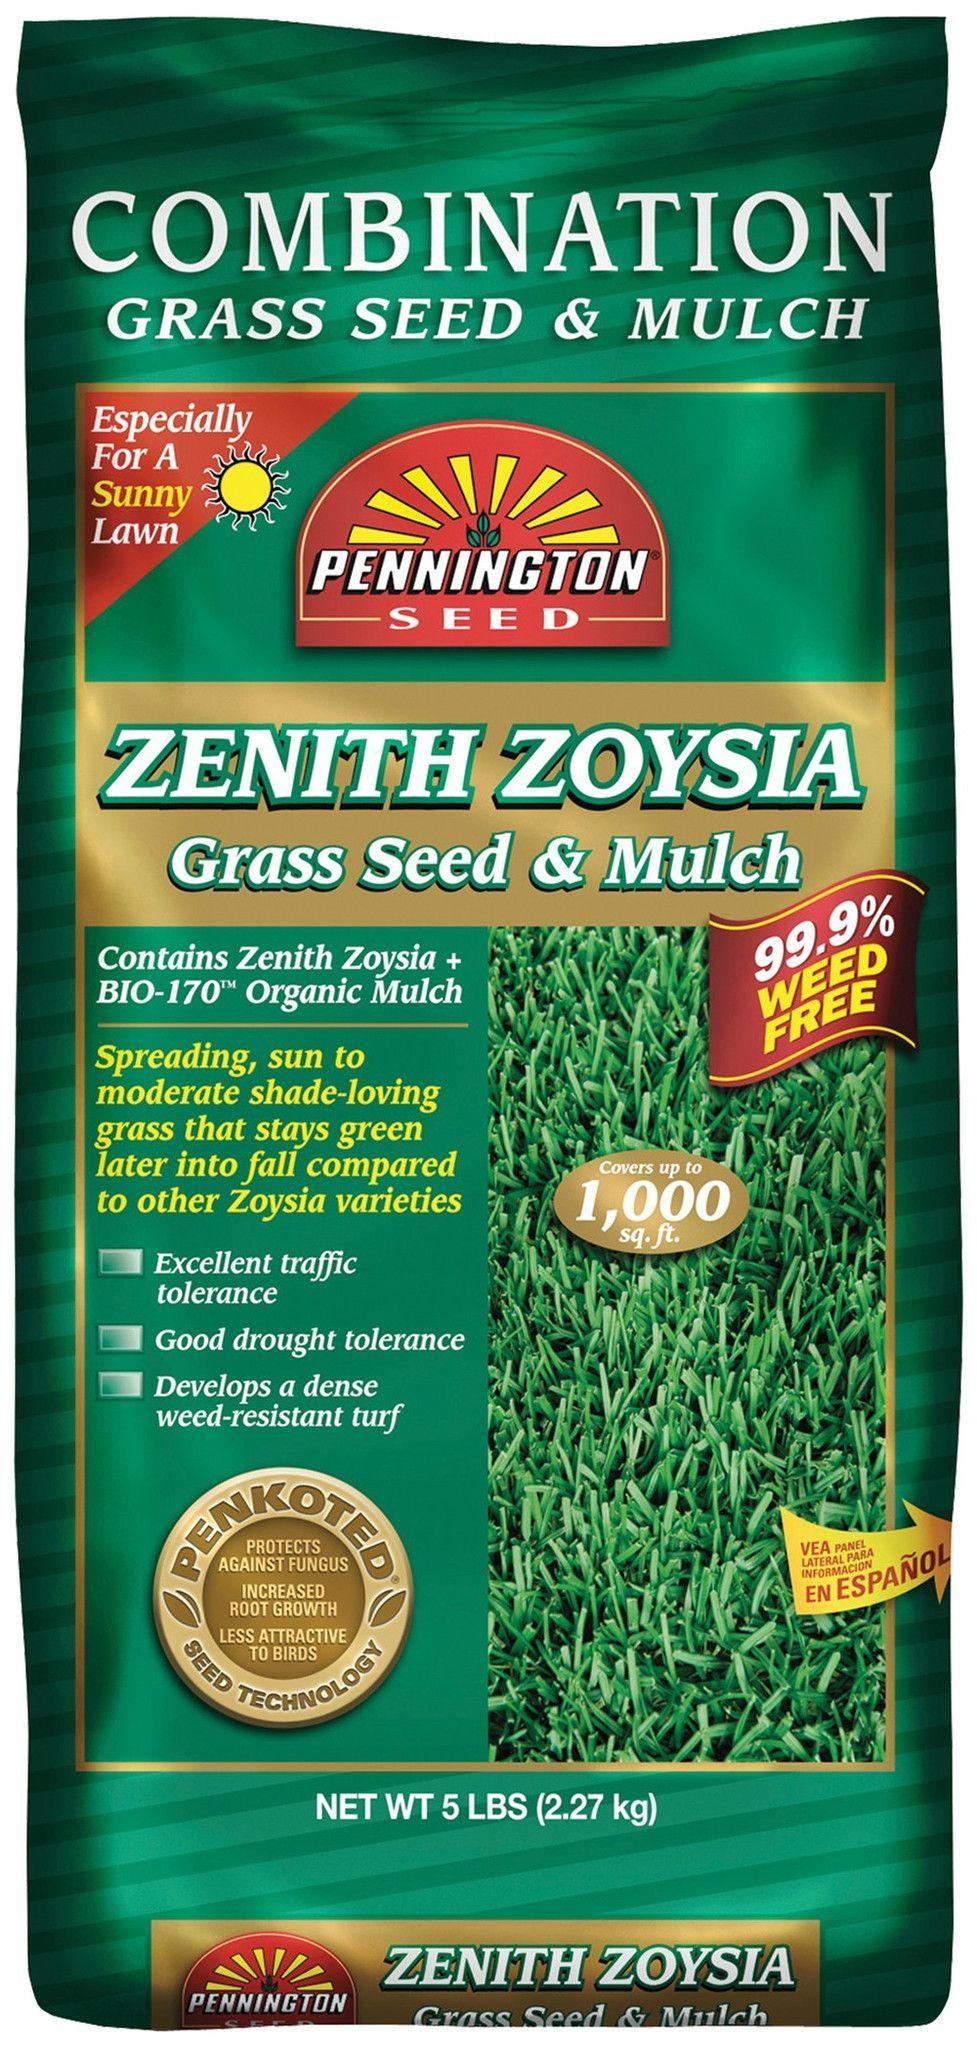 Pennington Zenith Zoysia Grass Seed With Mulch Zoysia Grass Seed Grass Seed Zoysia Grass